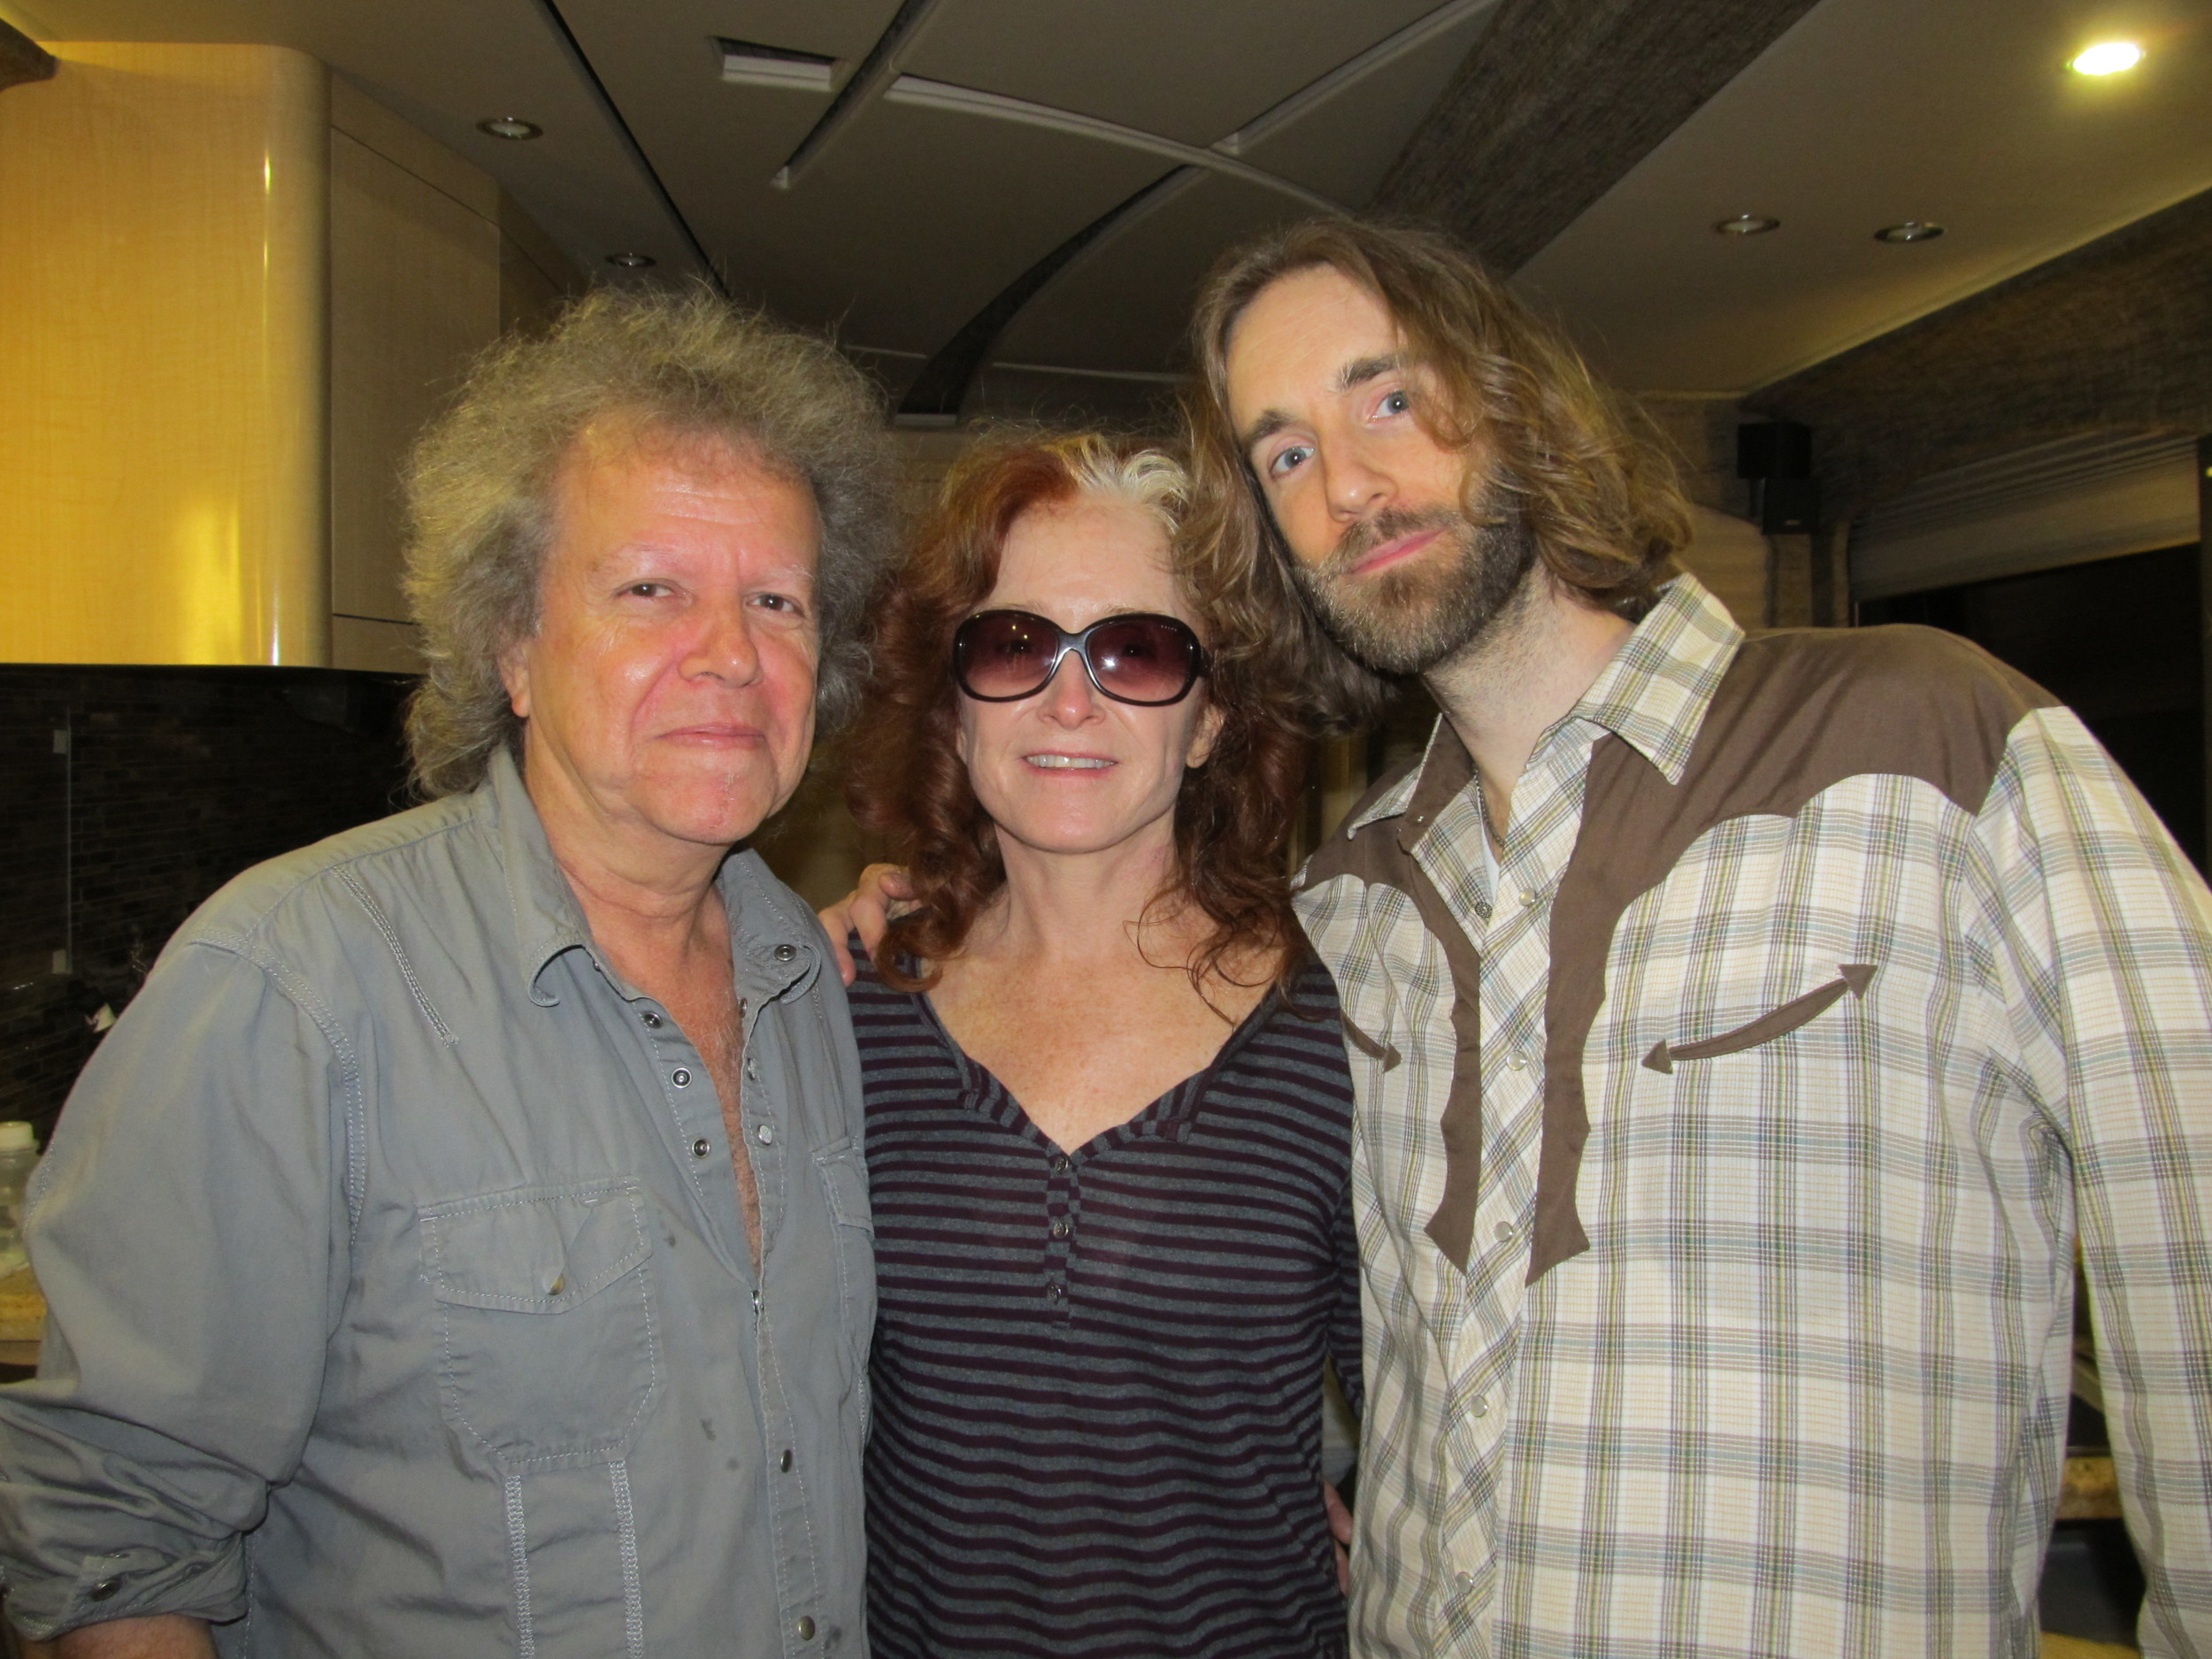 2012-06-03 - George Marinelli, Bonnie Raitt, Pete Pidgeon by Patrick Murray in Albany.jpg